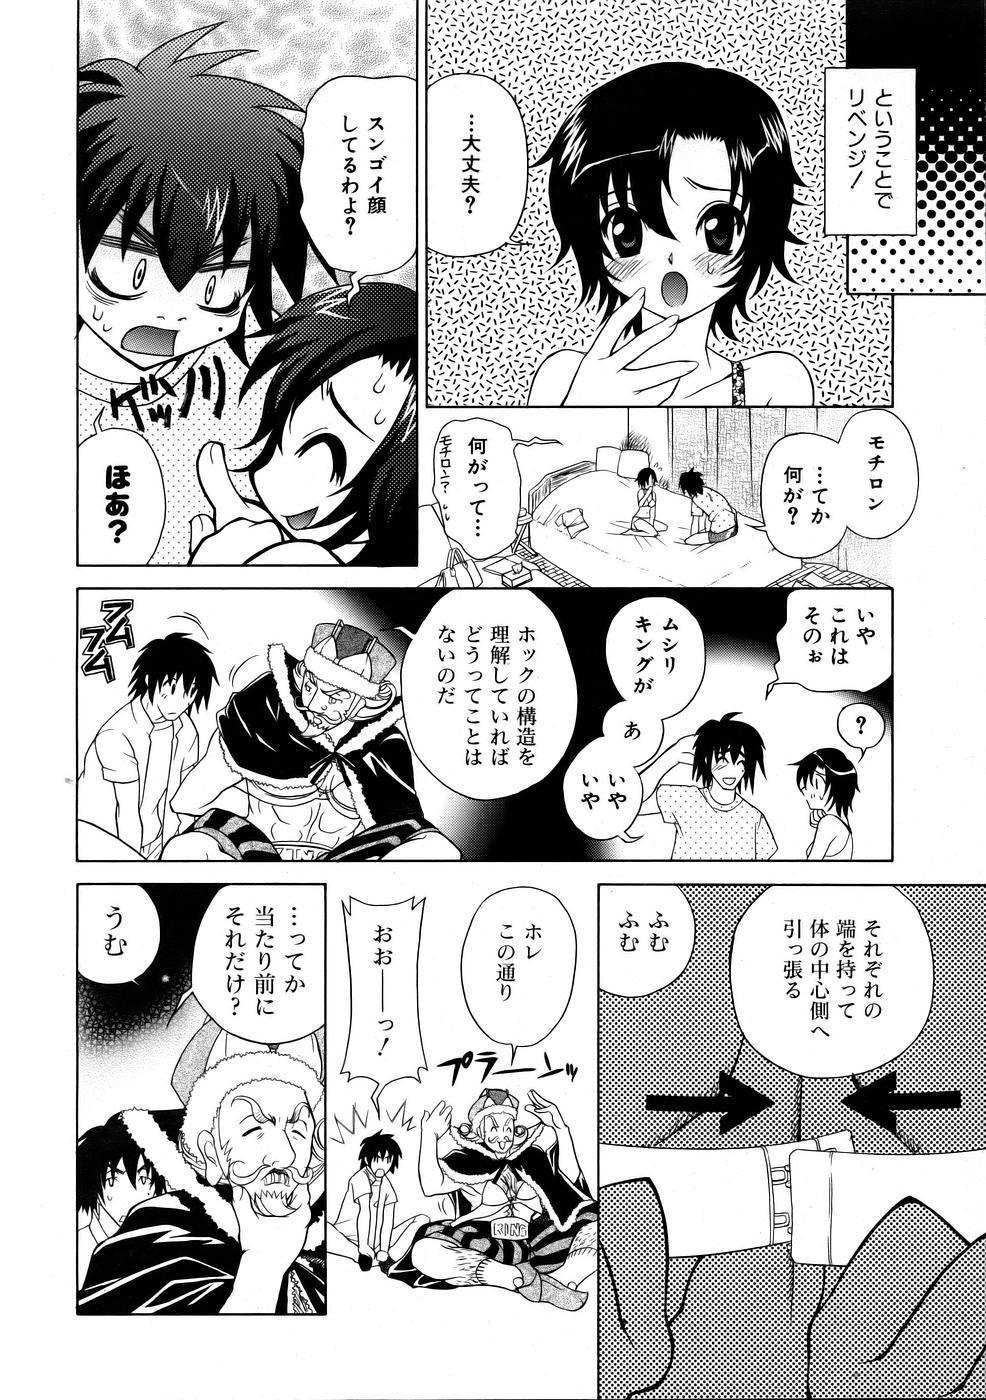 COMIC AUN 2005-10 Vol. 113 307